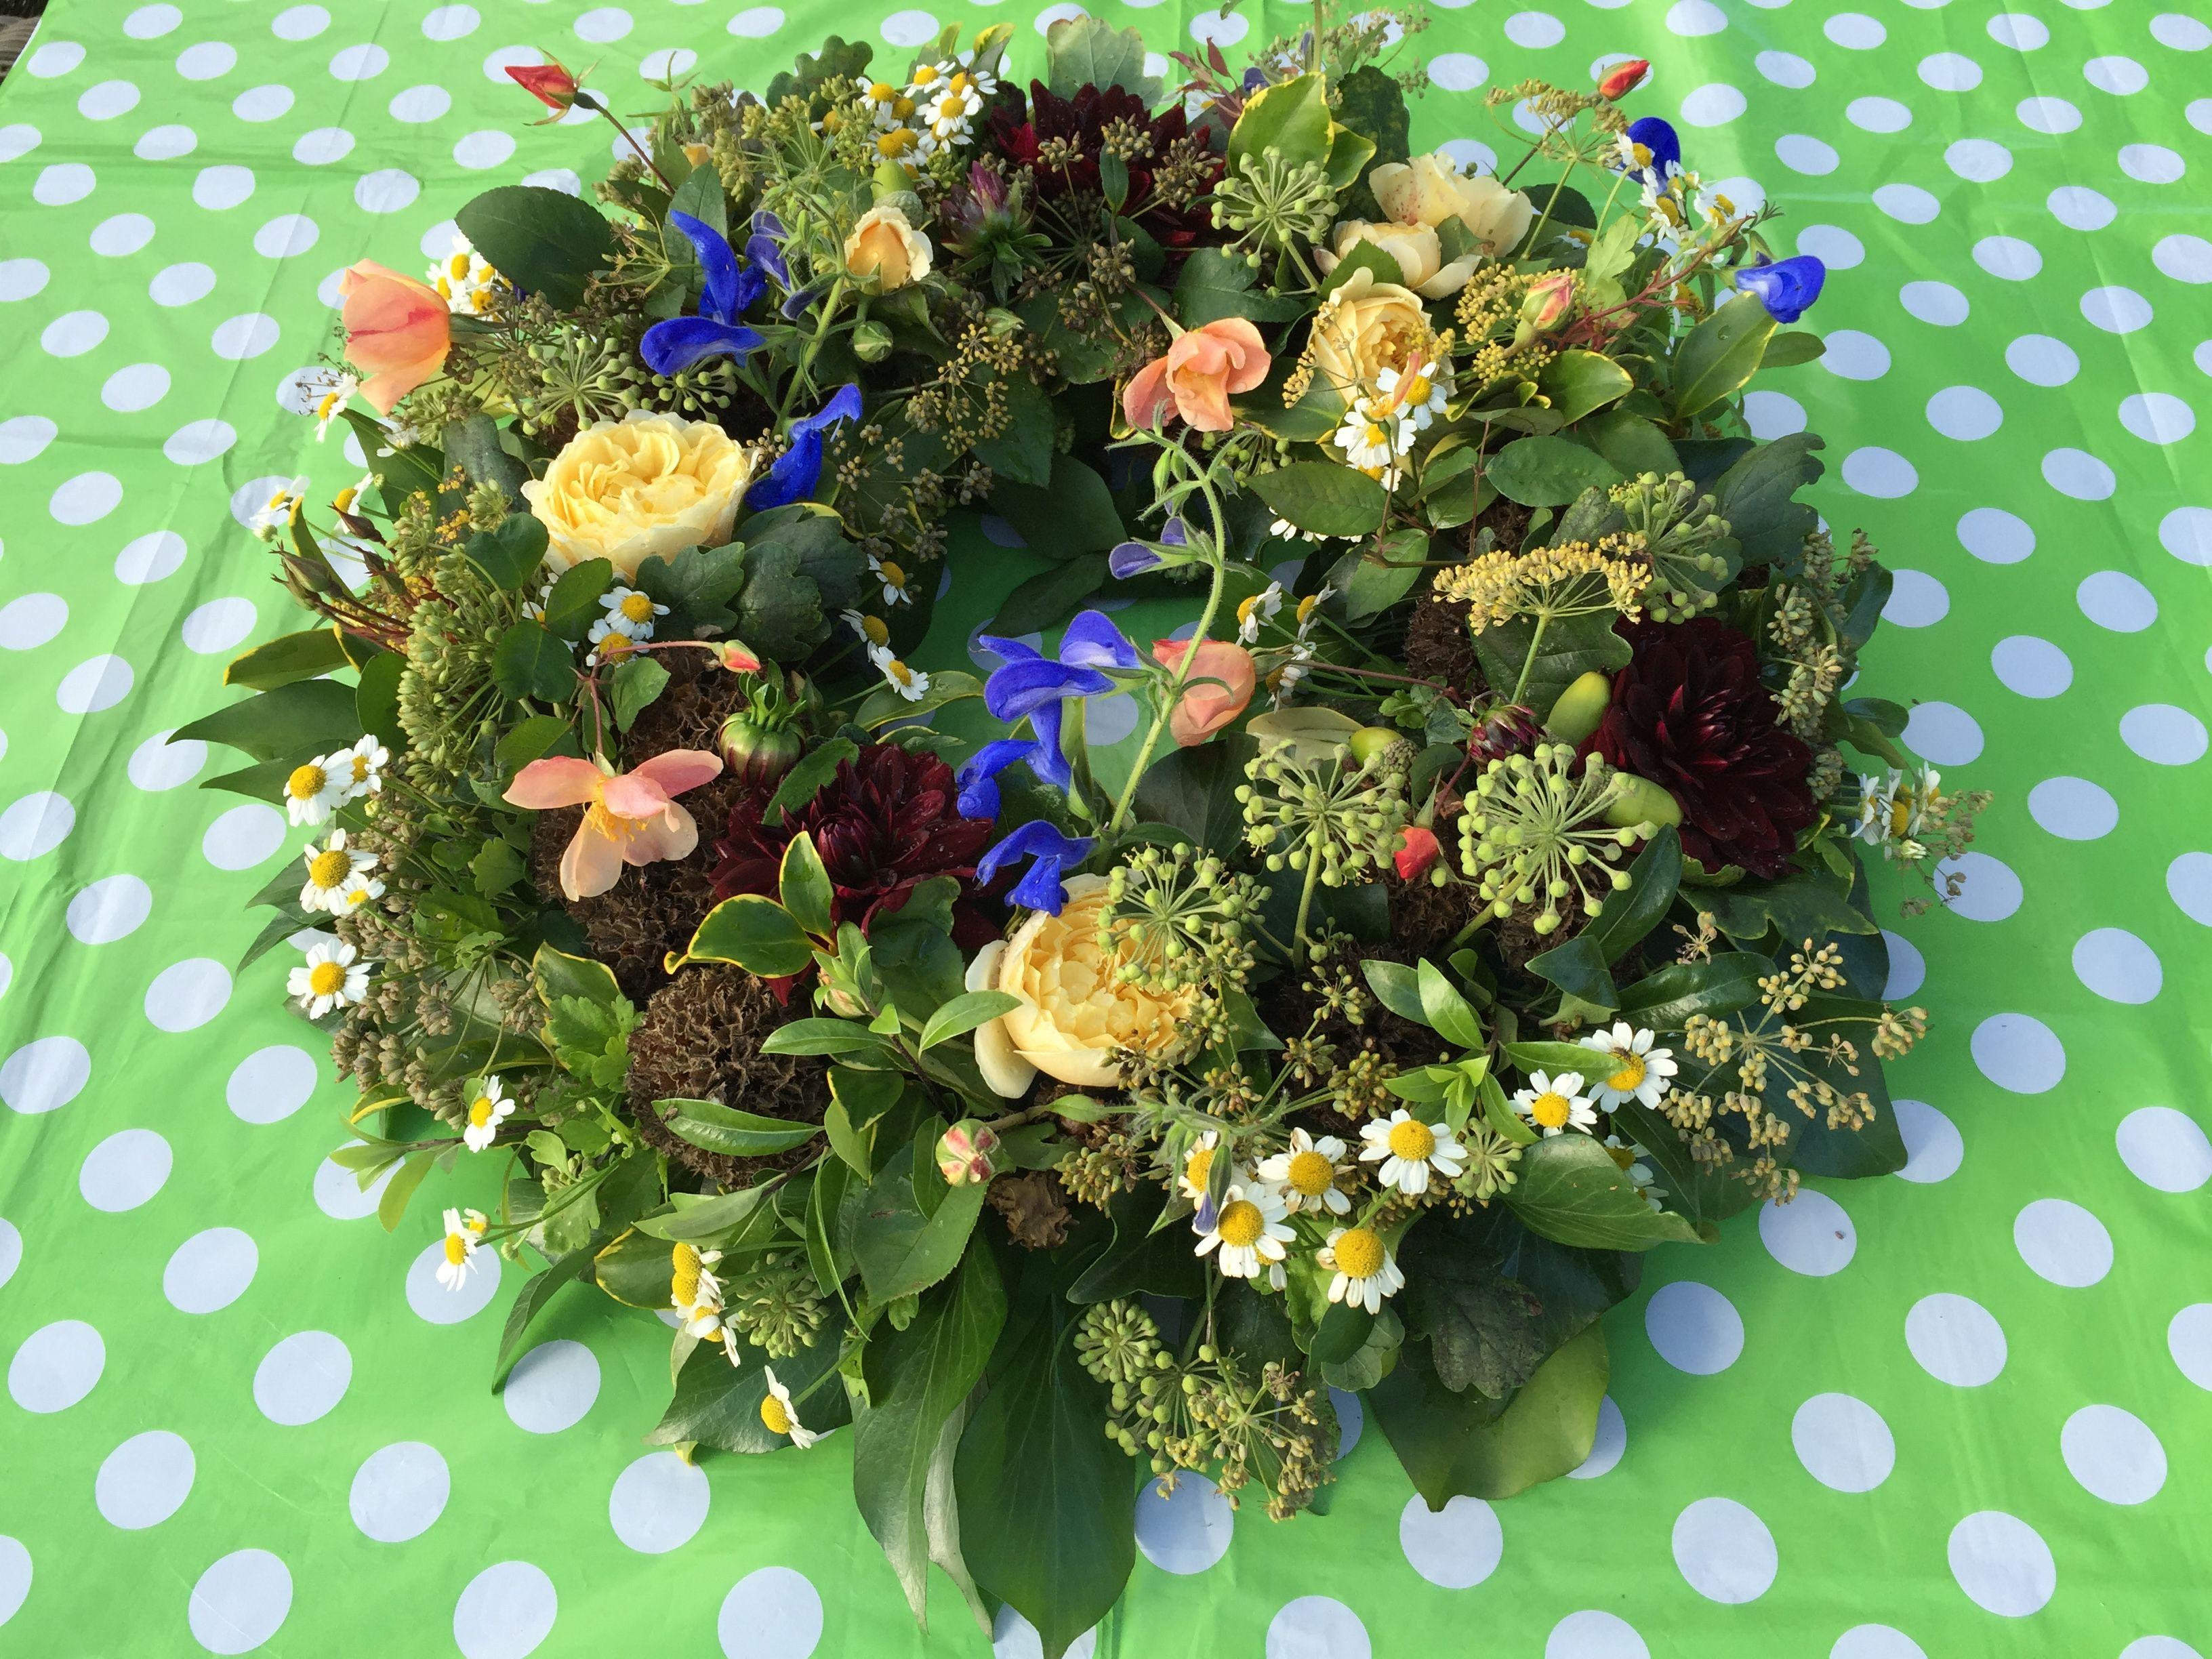 British Flowers Homegrown Fresh From Our Cottage Garden Wreath